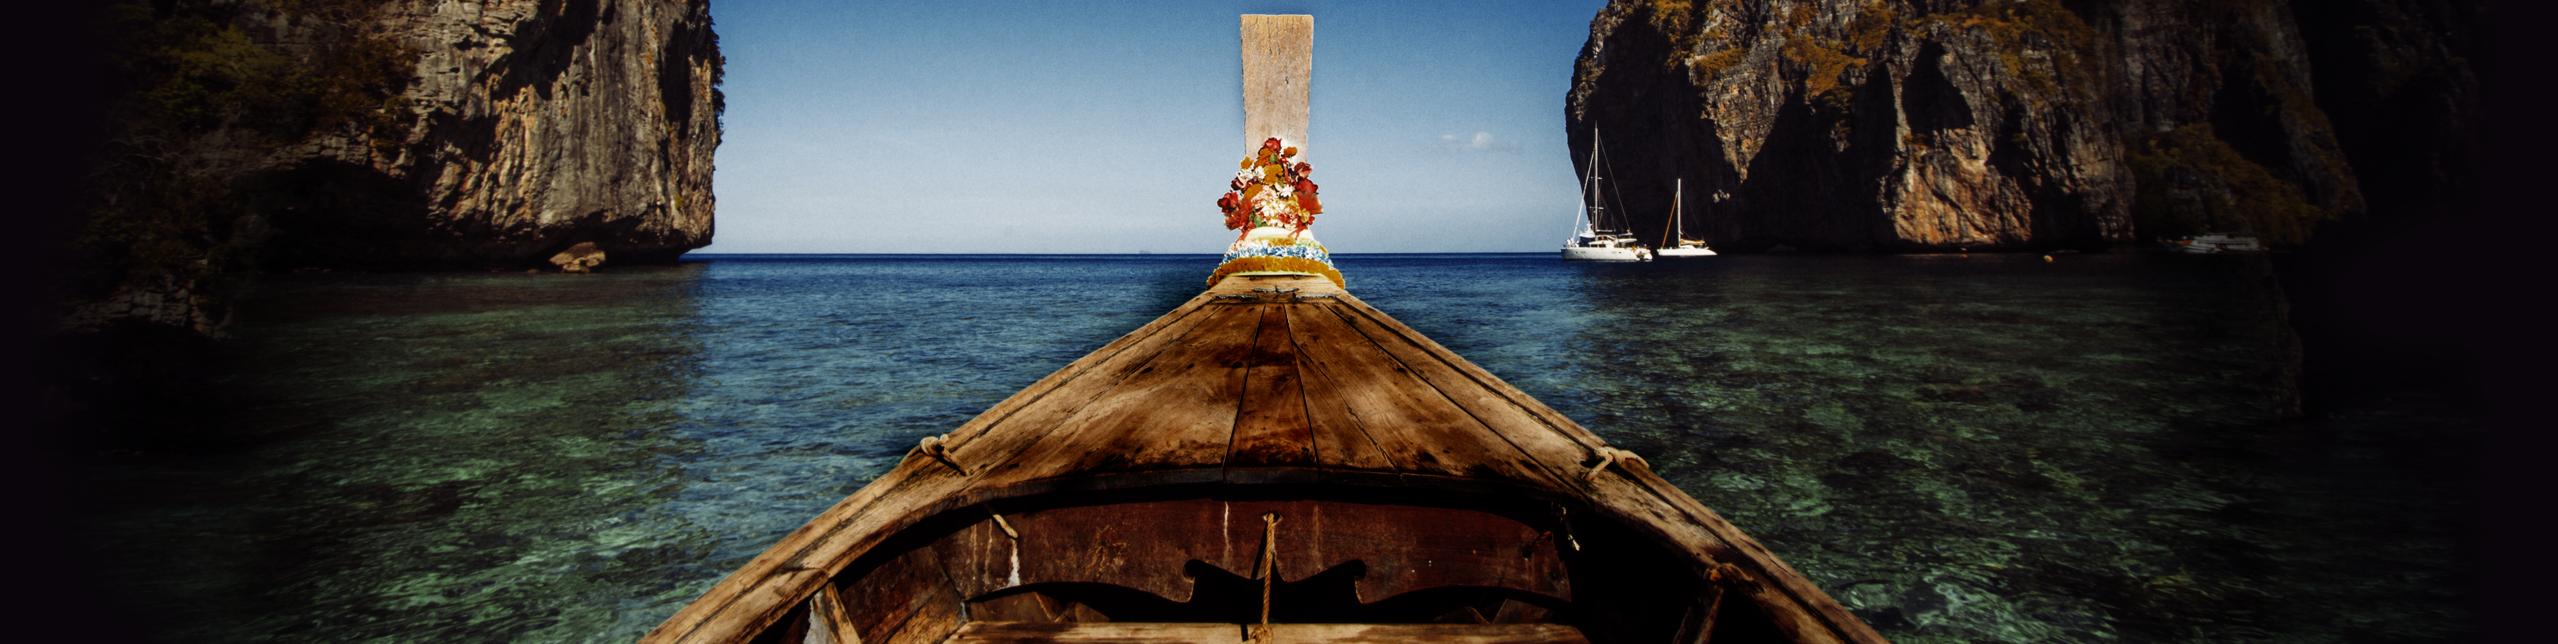 boat_slide_3